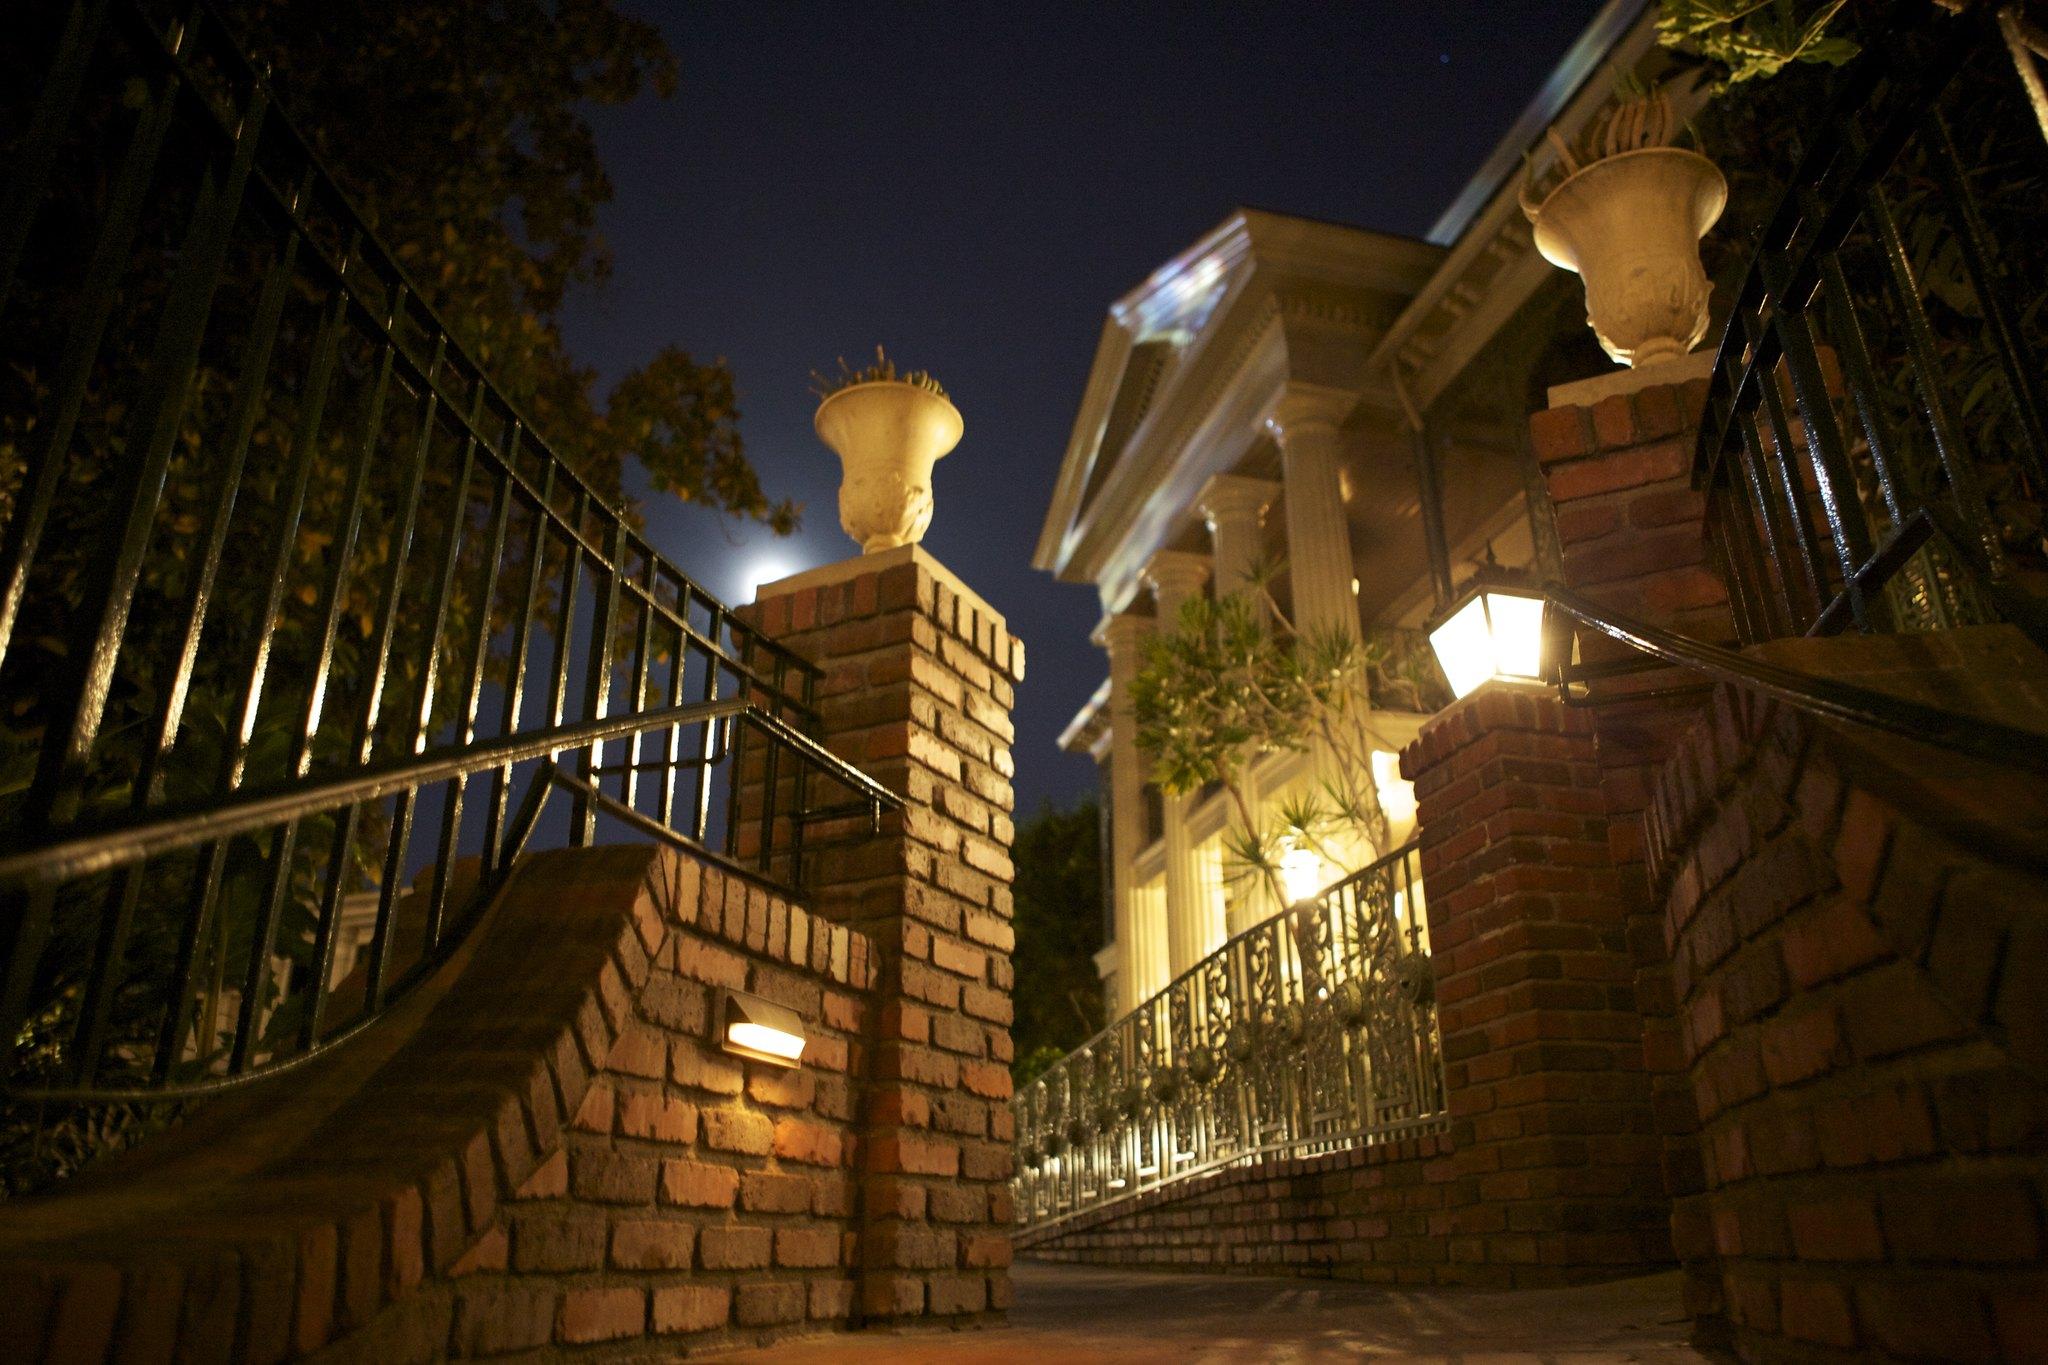 Haunted Mansion Moonlit